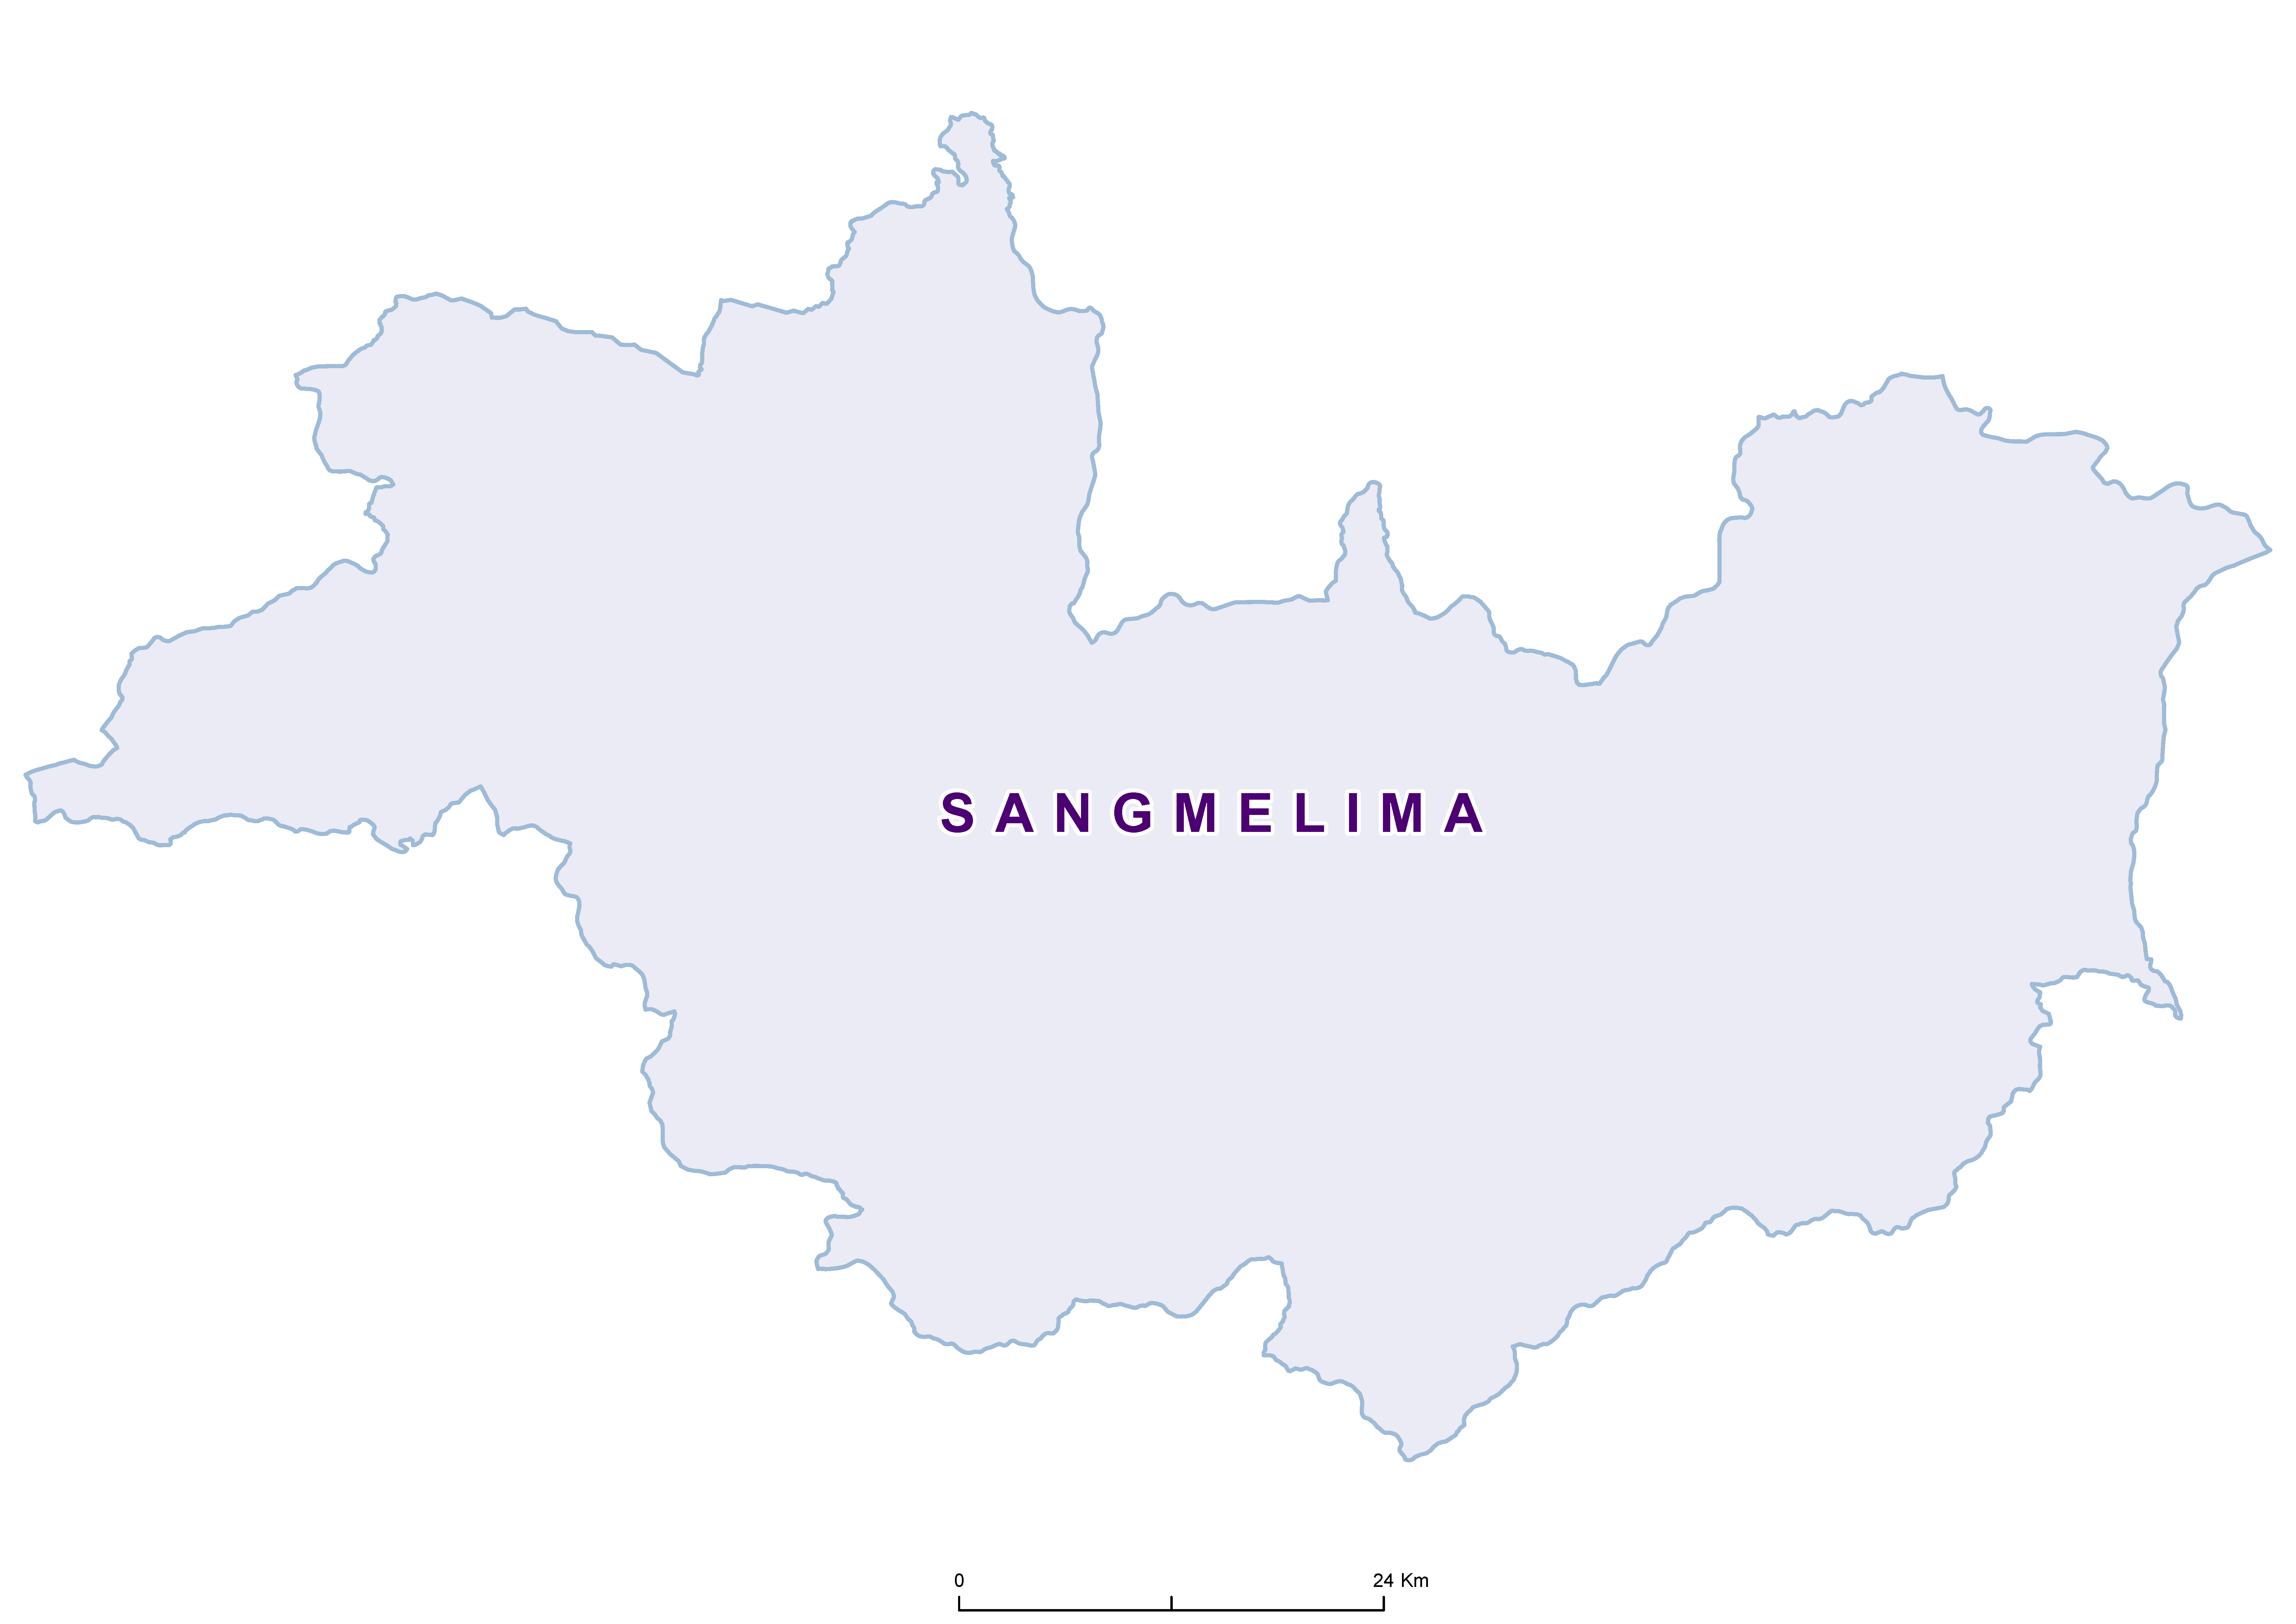 Sangmelima Mean SCH 20180001